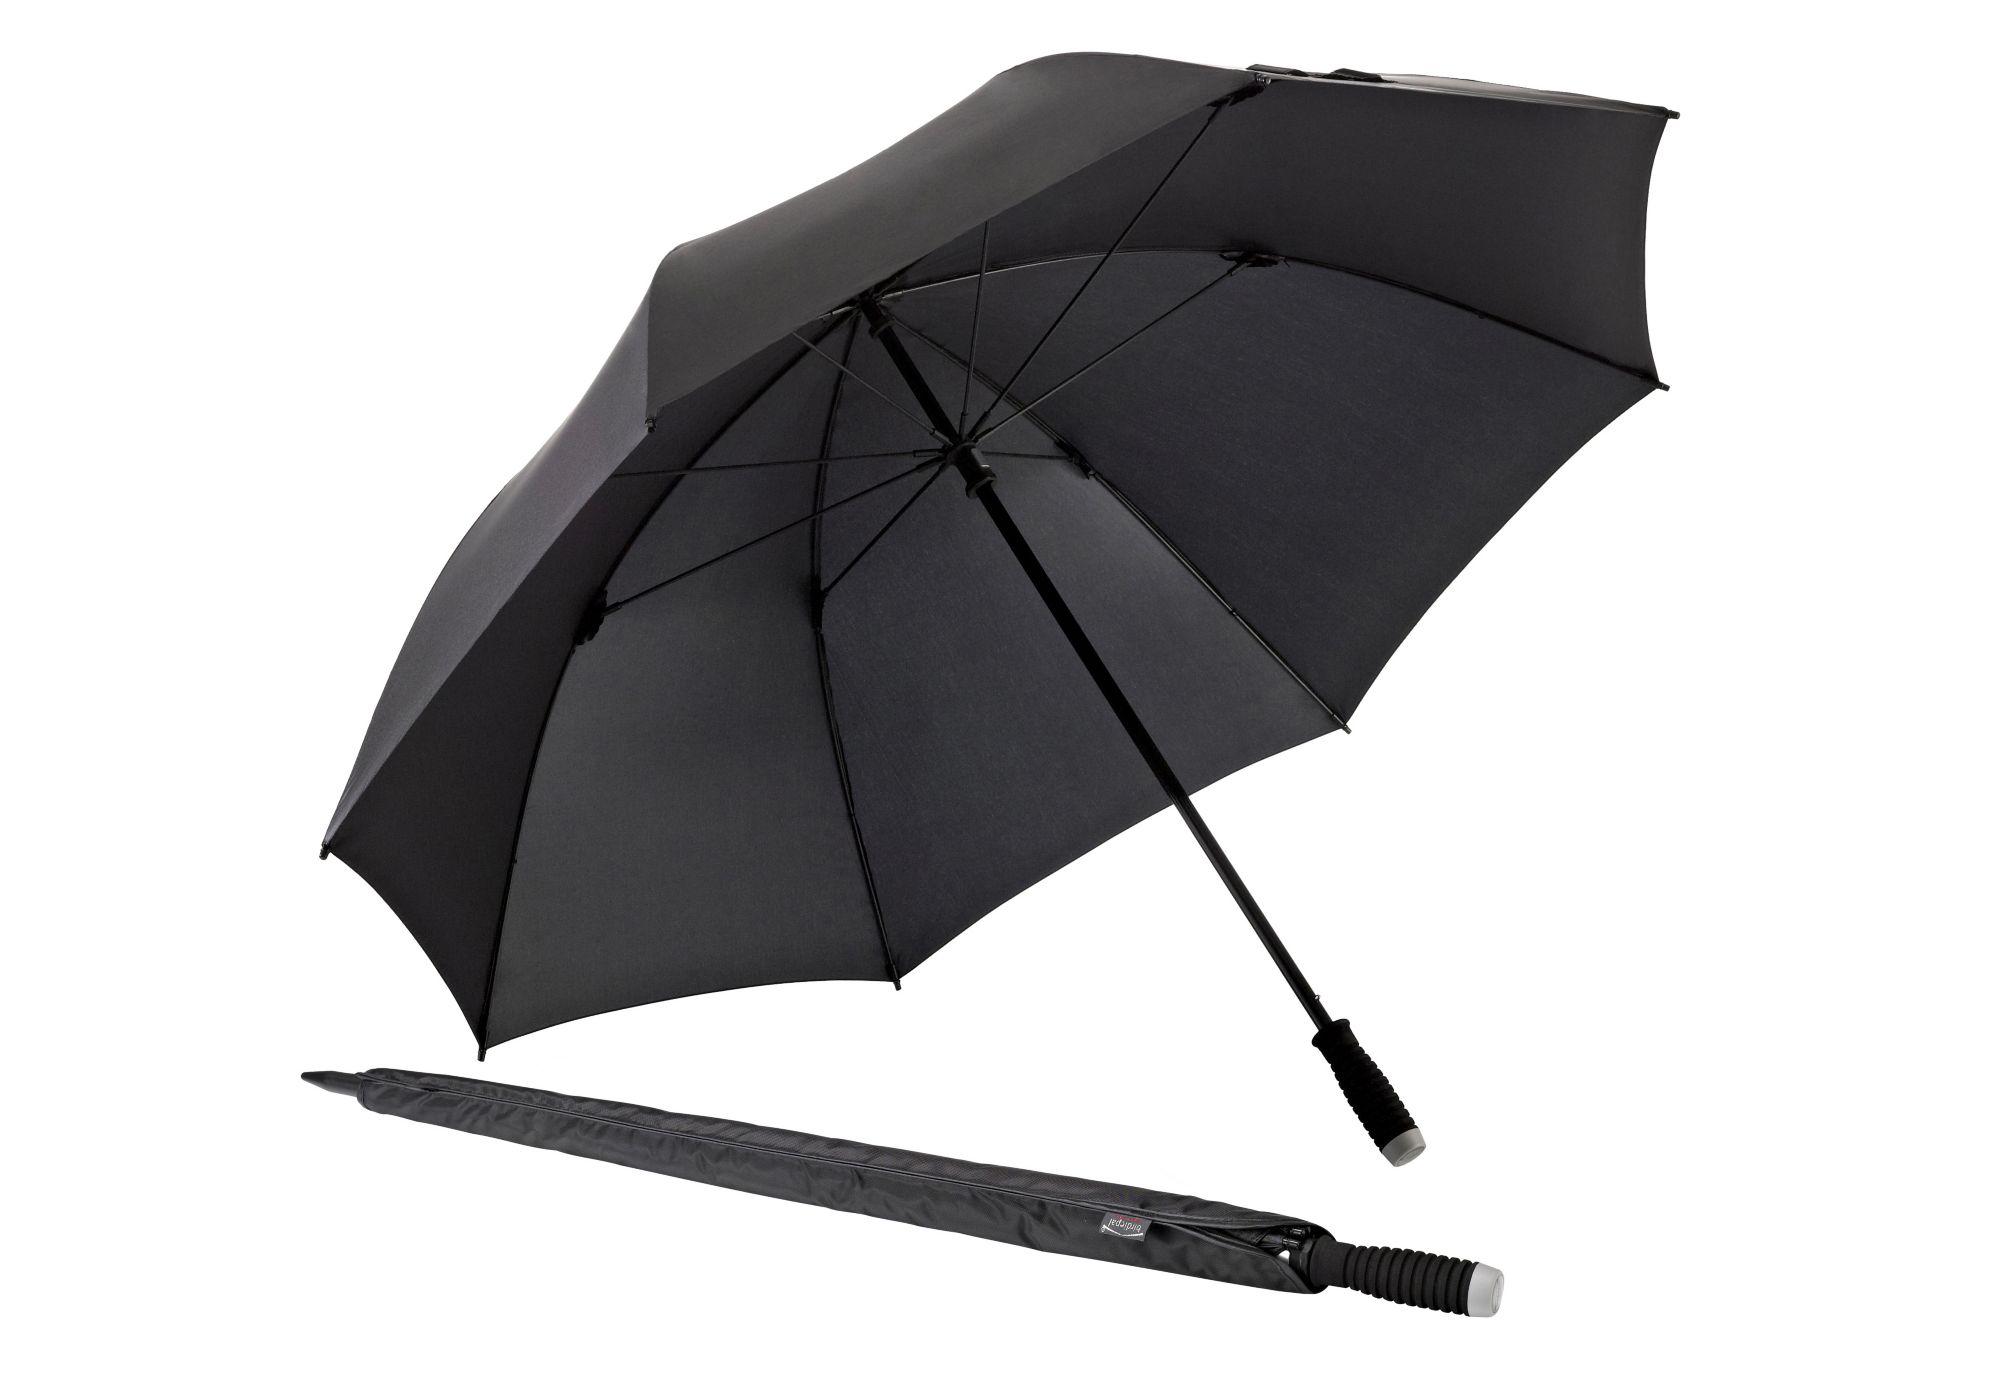 EUROSCHIRM® Euroschirm® Regenschirm Golfschirm, »birdiepal® lightflex«